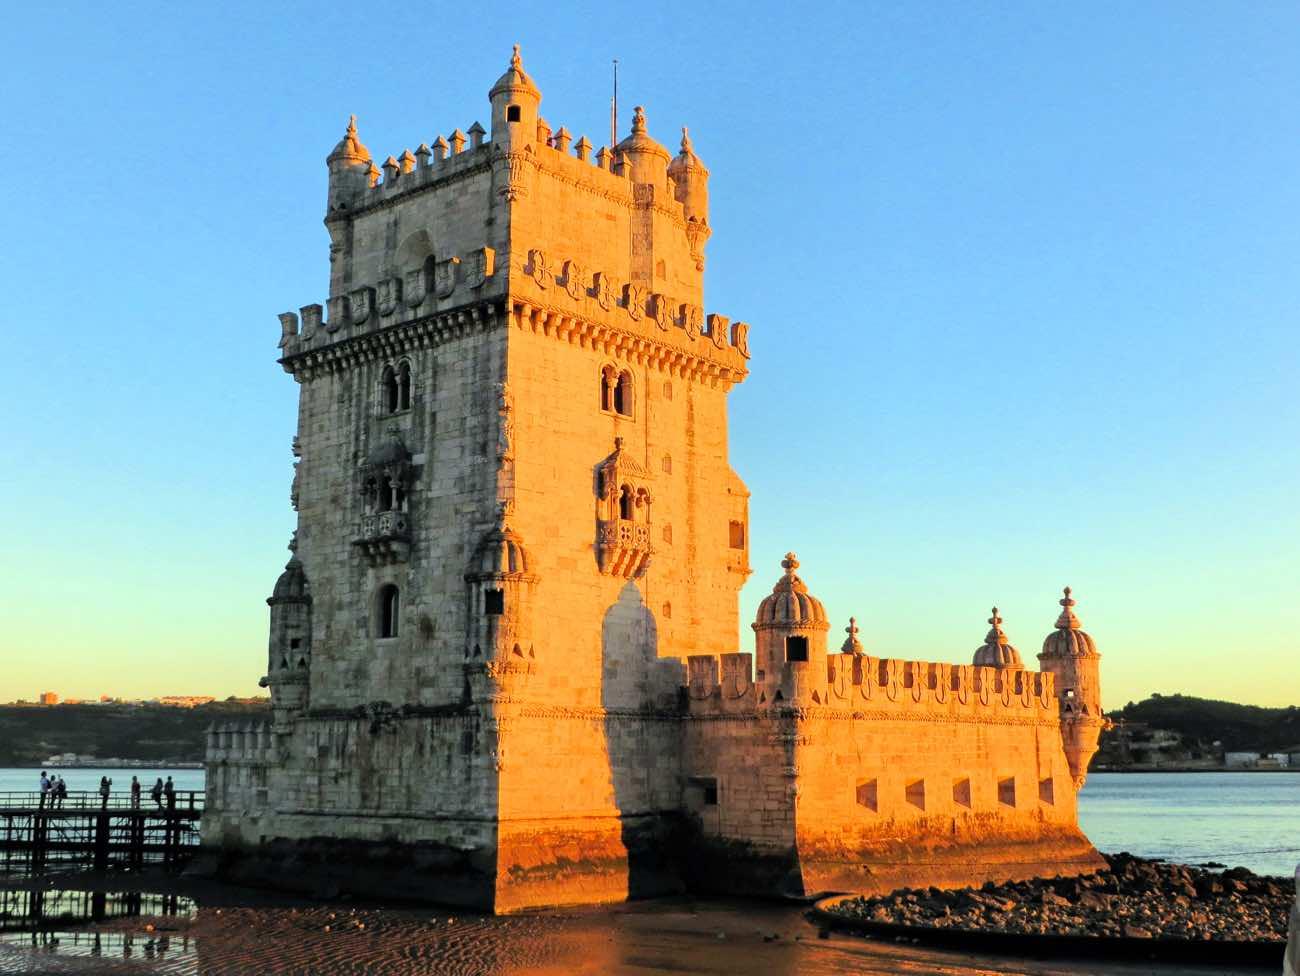 lisbon itinerary 3 days belem tower